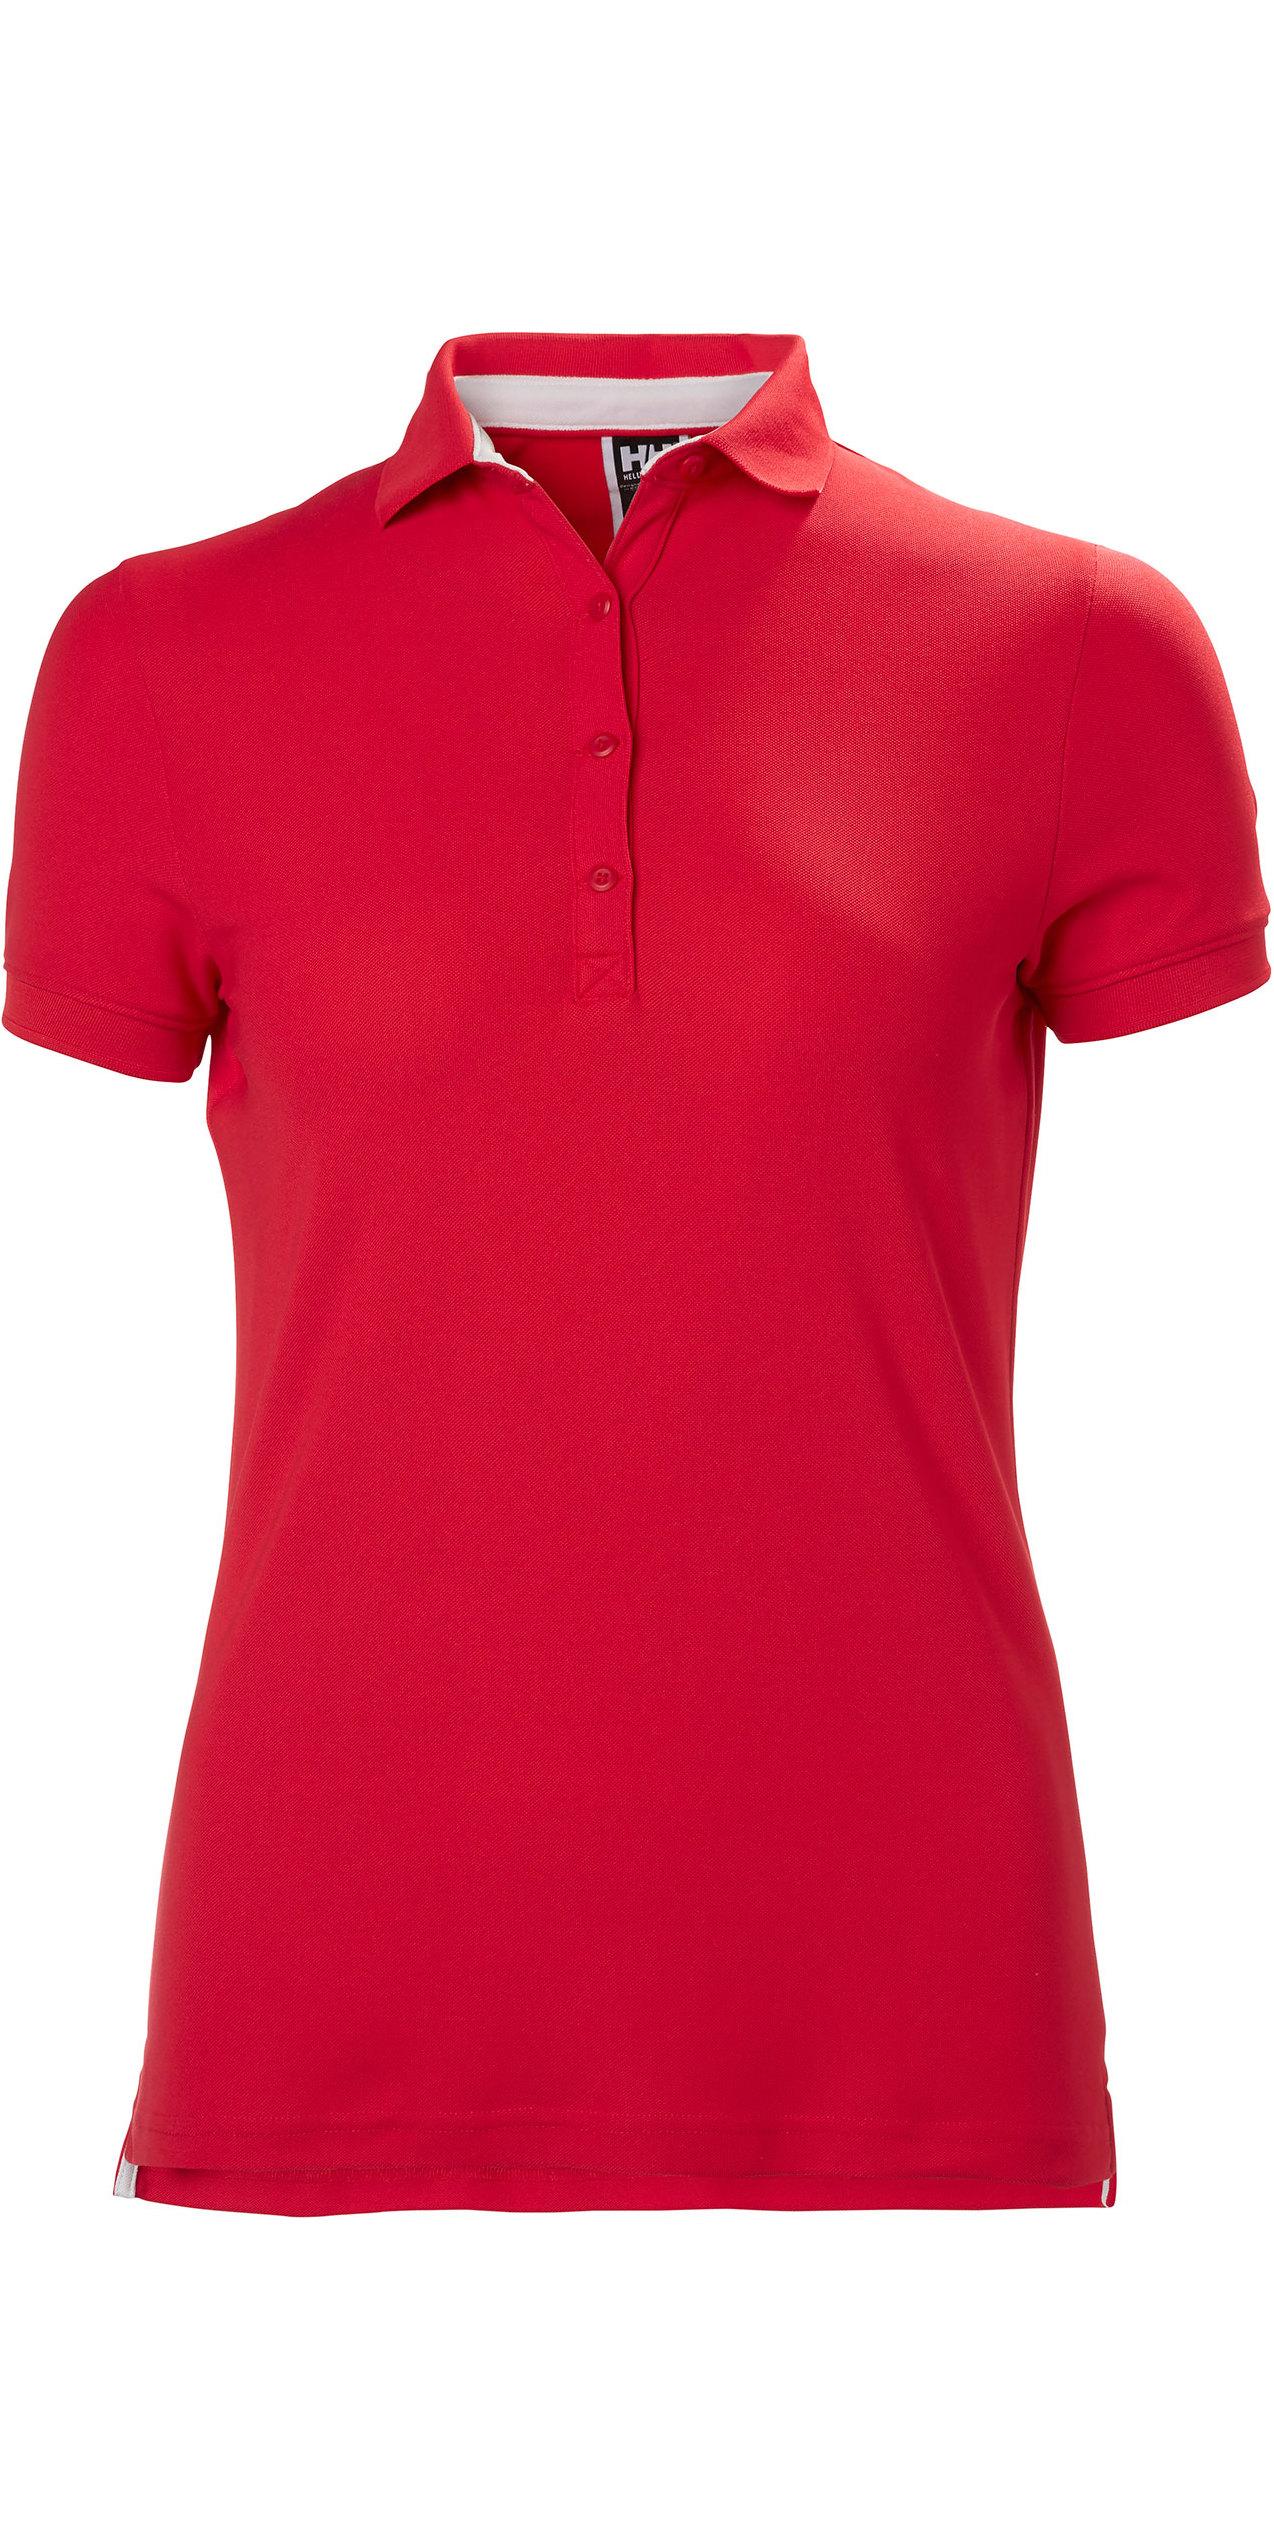 2019 Helly Hansen Crewline Helly Hansen Crewline Polo Shirt Flag Red 53049